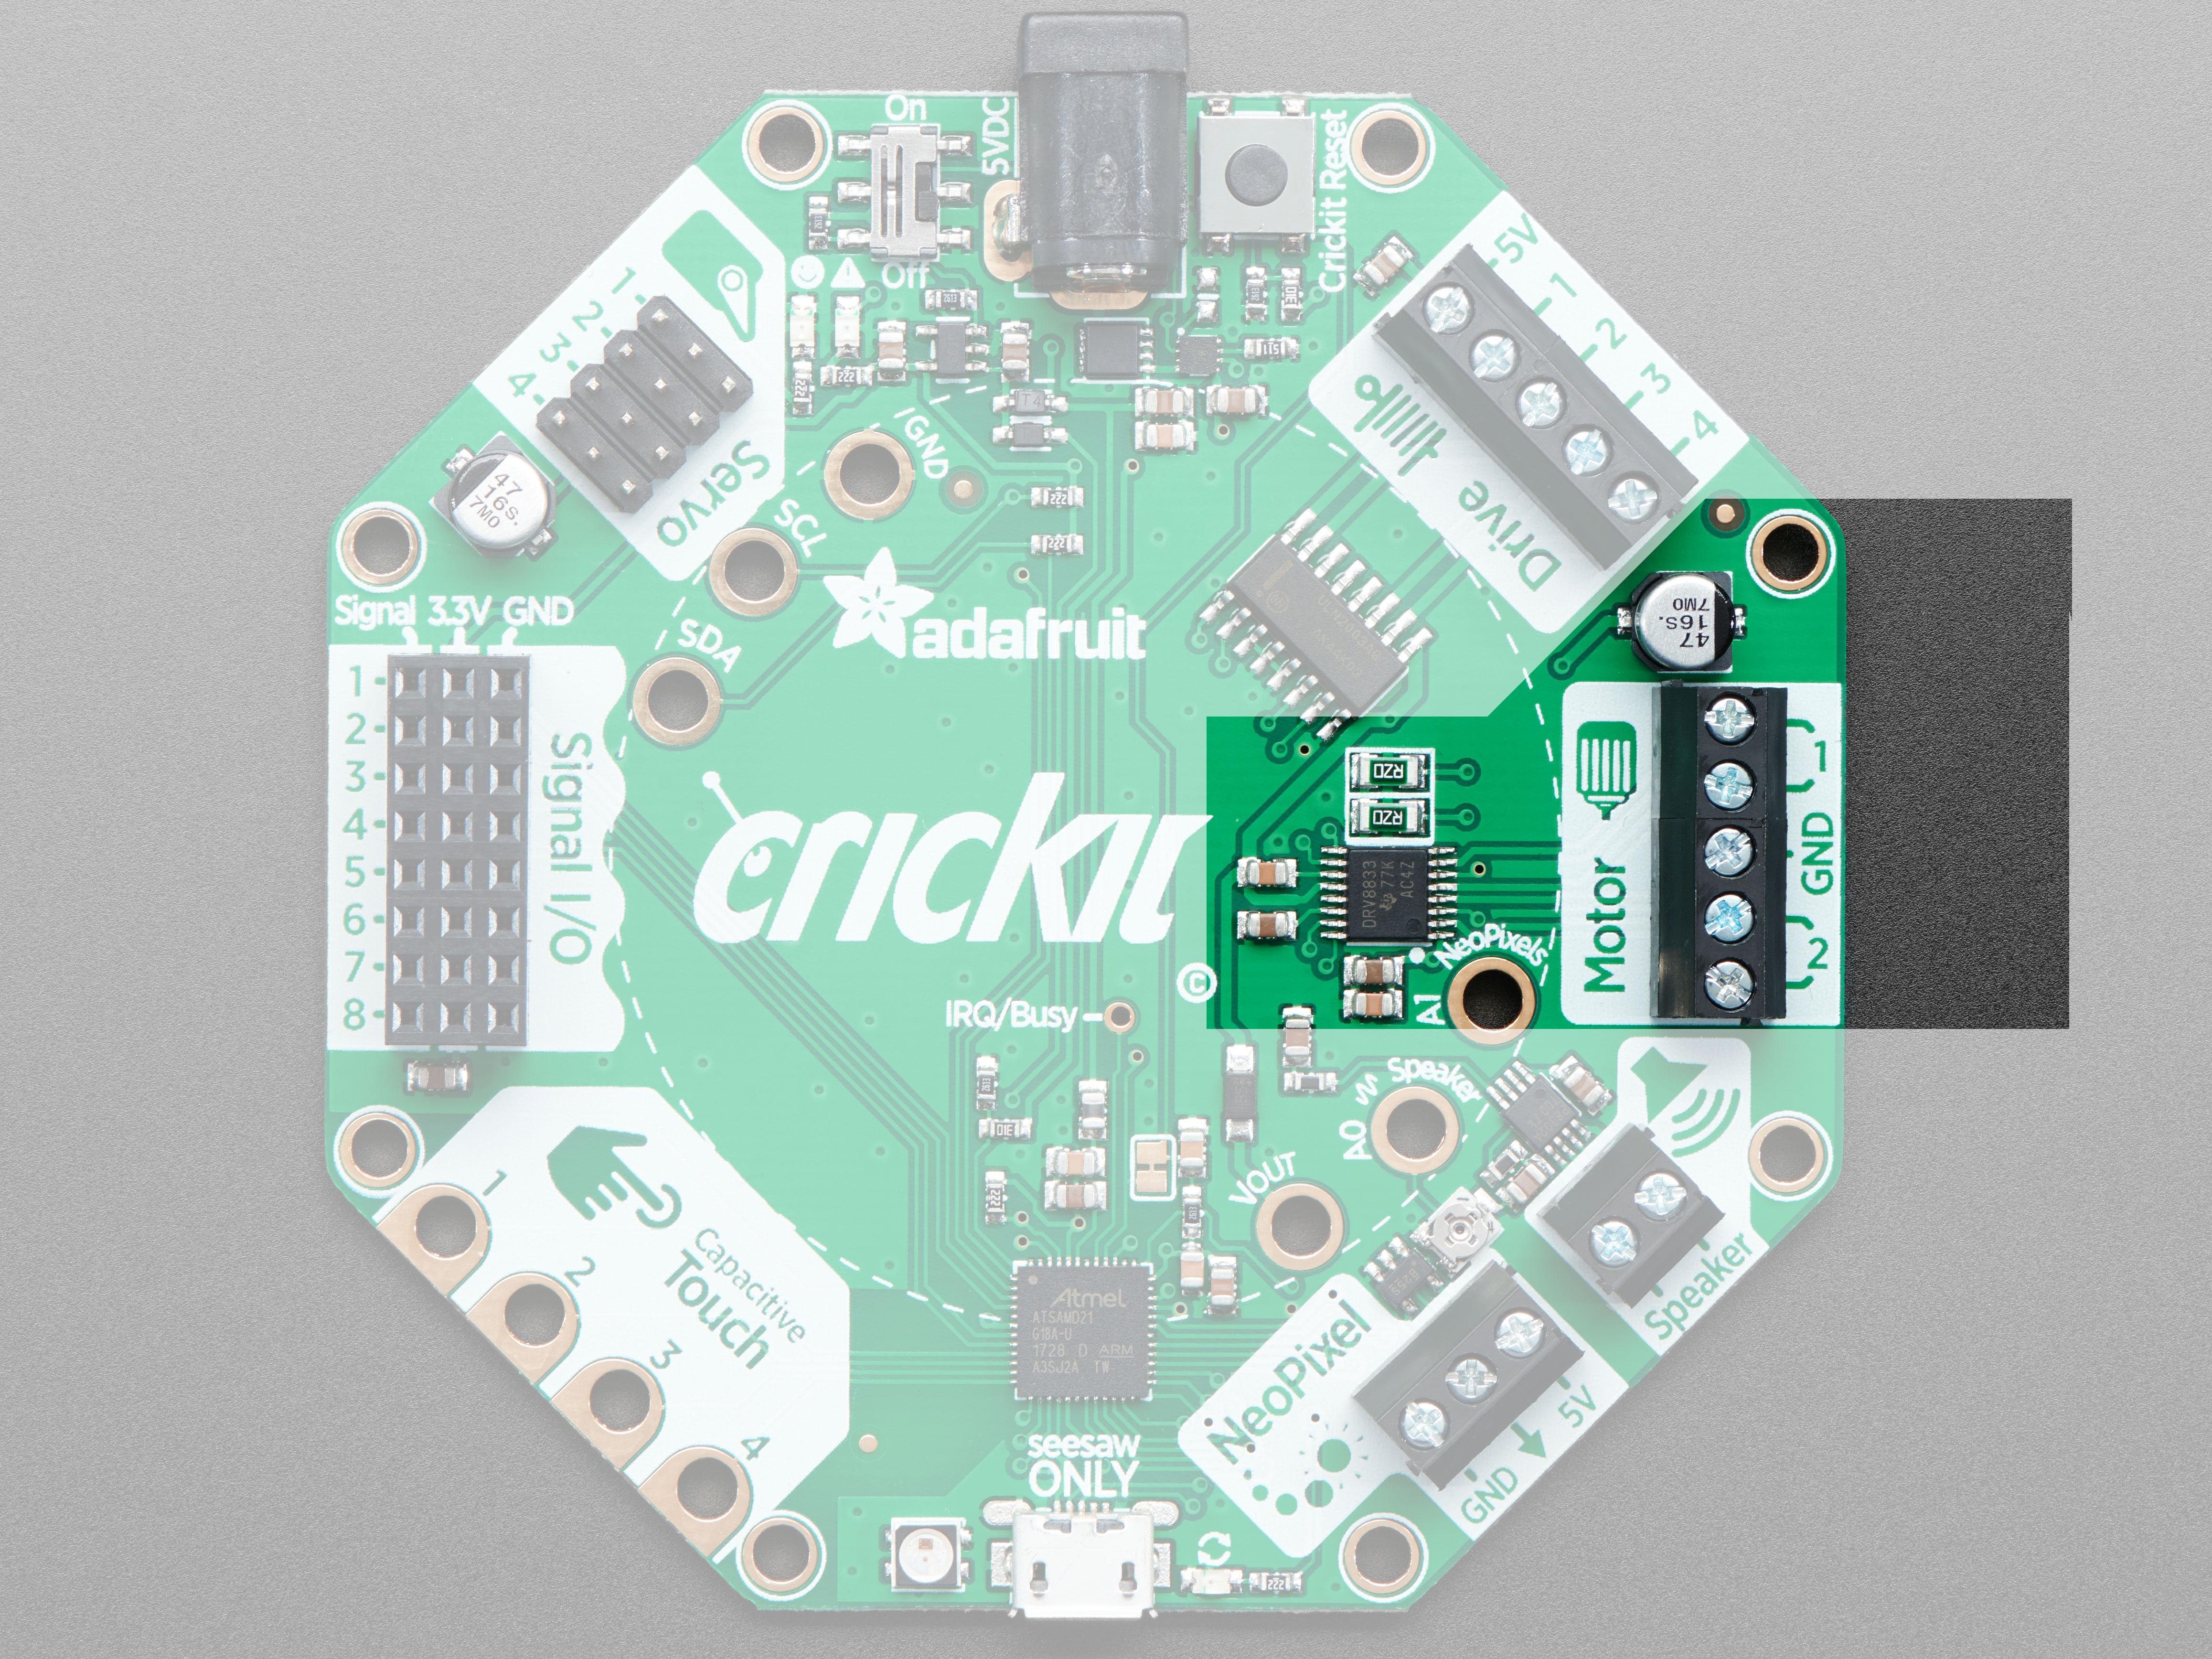 robotics___cnc_circuit_playground_motor.jpg